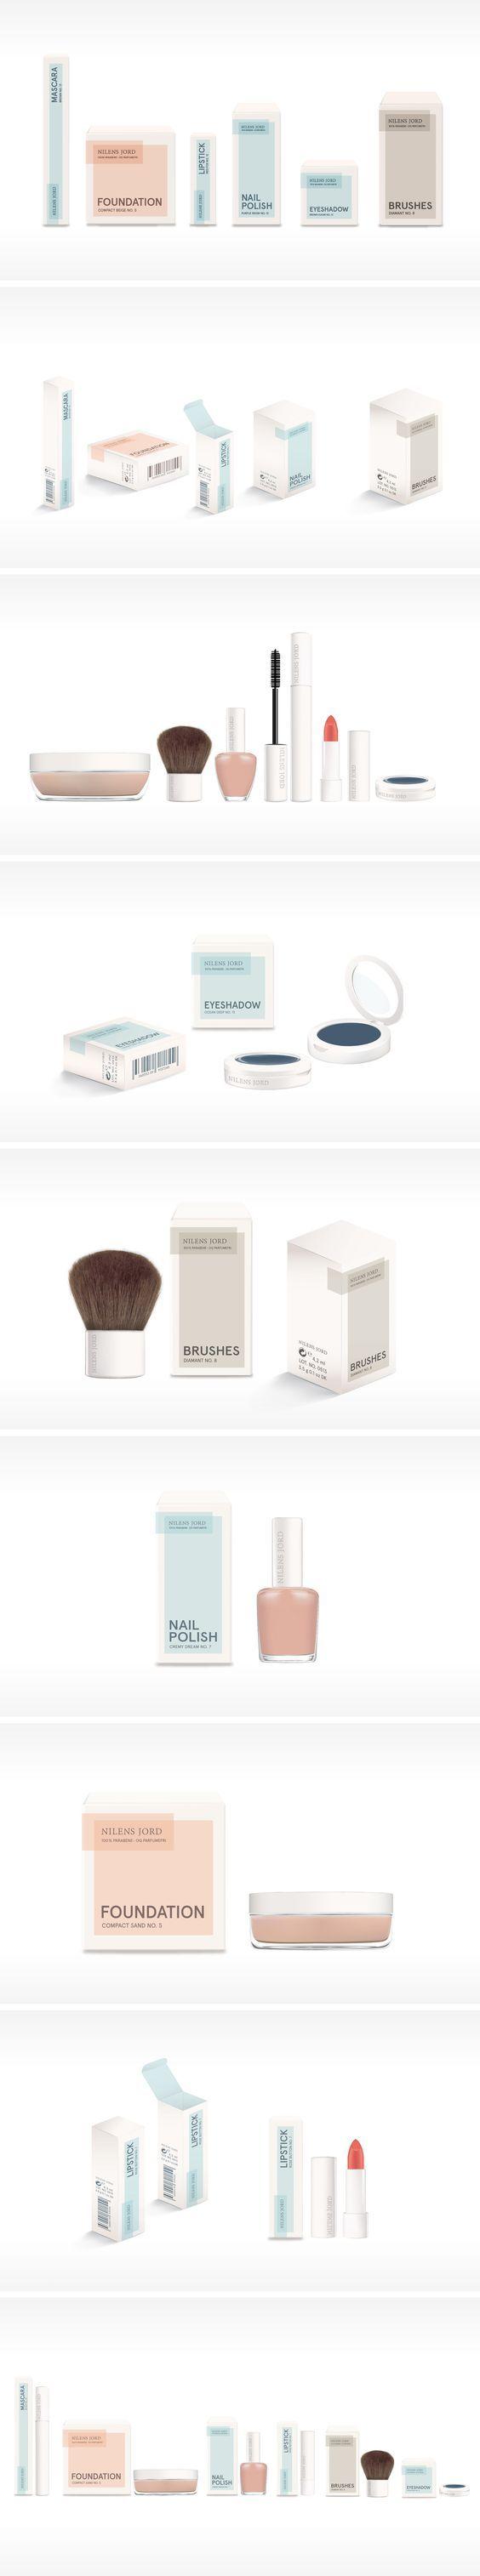 Niles Jord Cosmetic Packaging by Camilla Heegaard Severinsen   Fivestar Branding – Design and Branding Agency & Inspiration Gallery